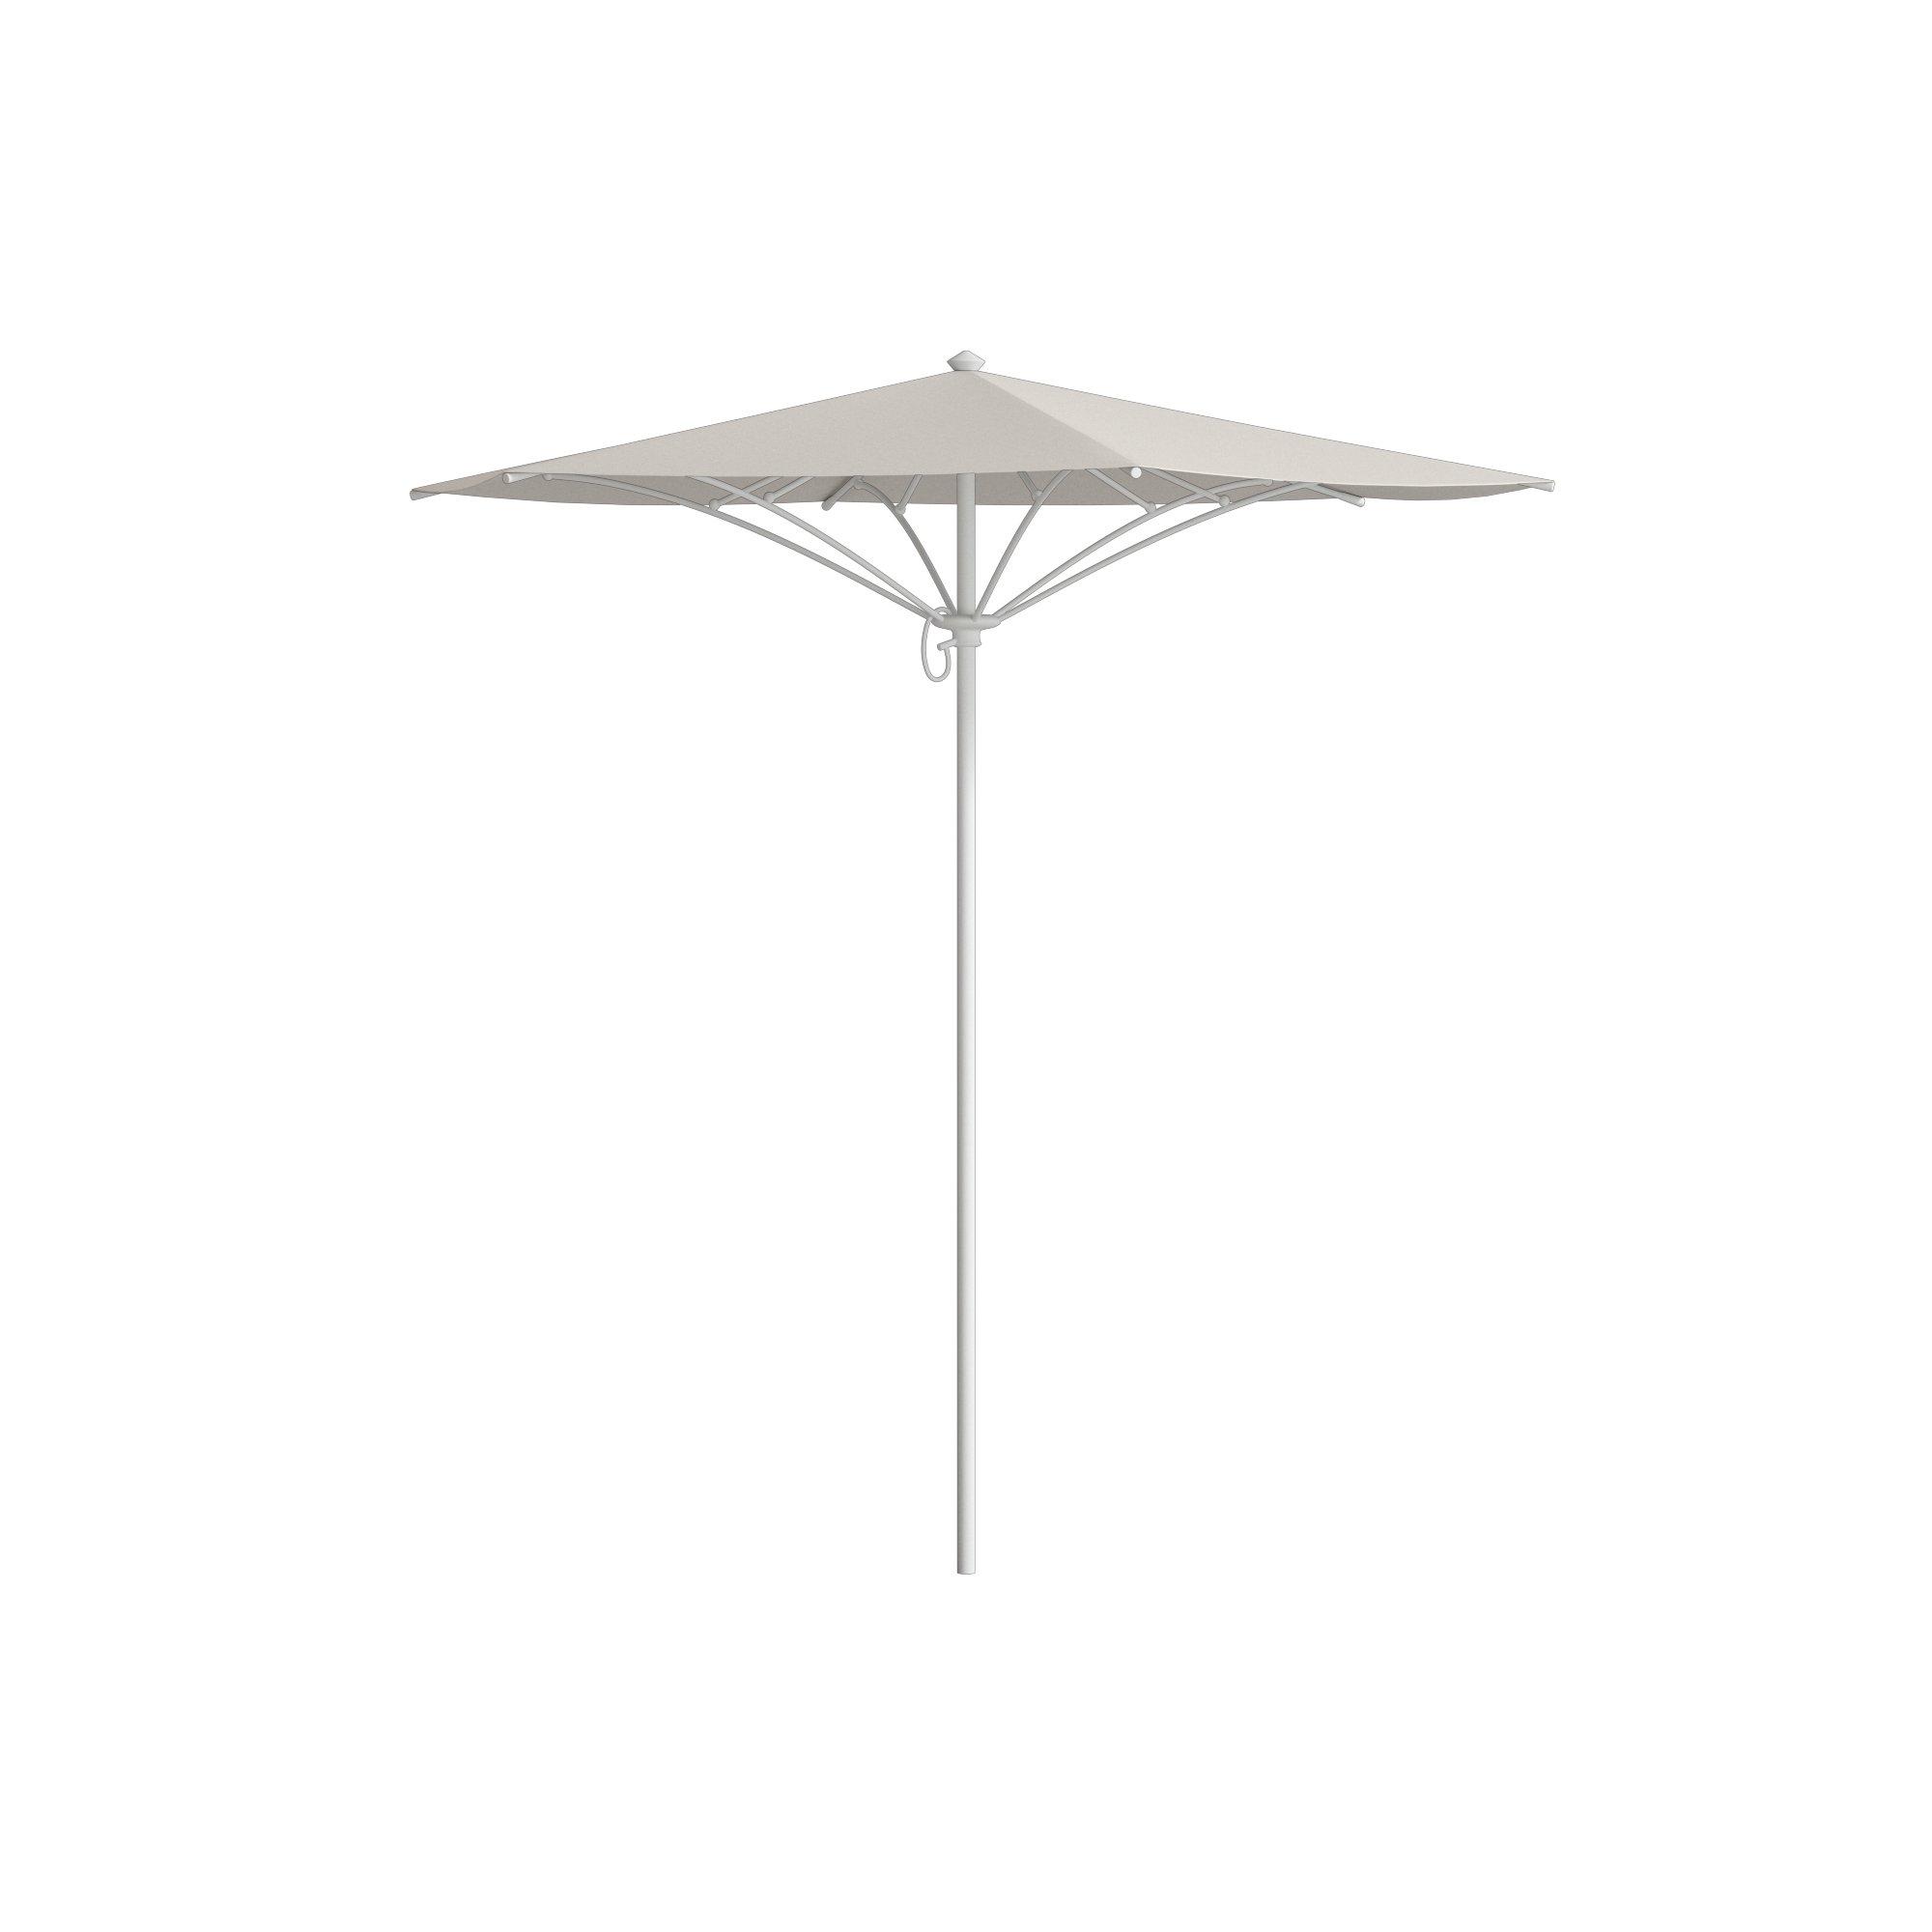 Trace 8' Market Umbrella Throughout Fashionable Darwen Tiltable Patio Stripe Market Umbrellas (View 17 of 20)